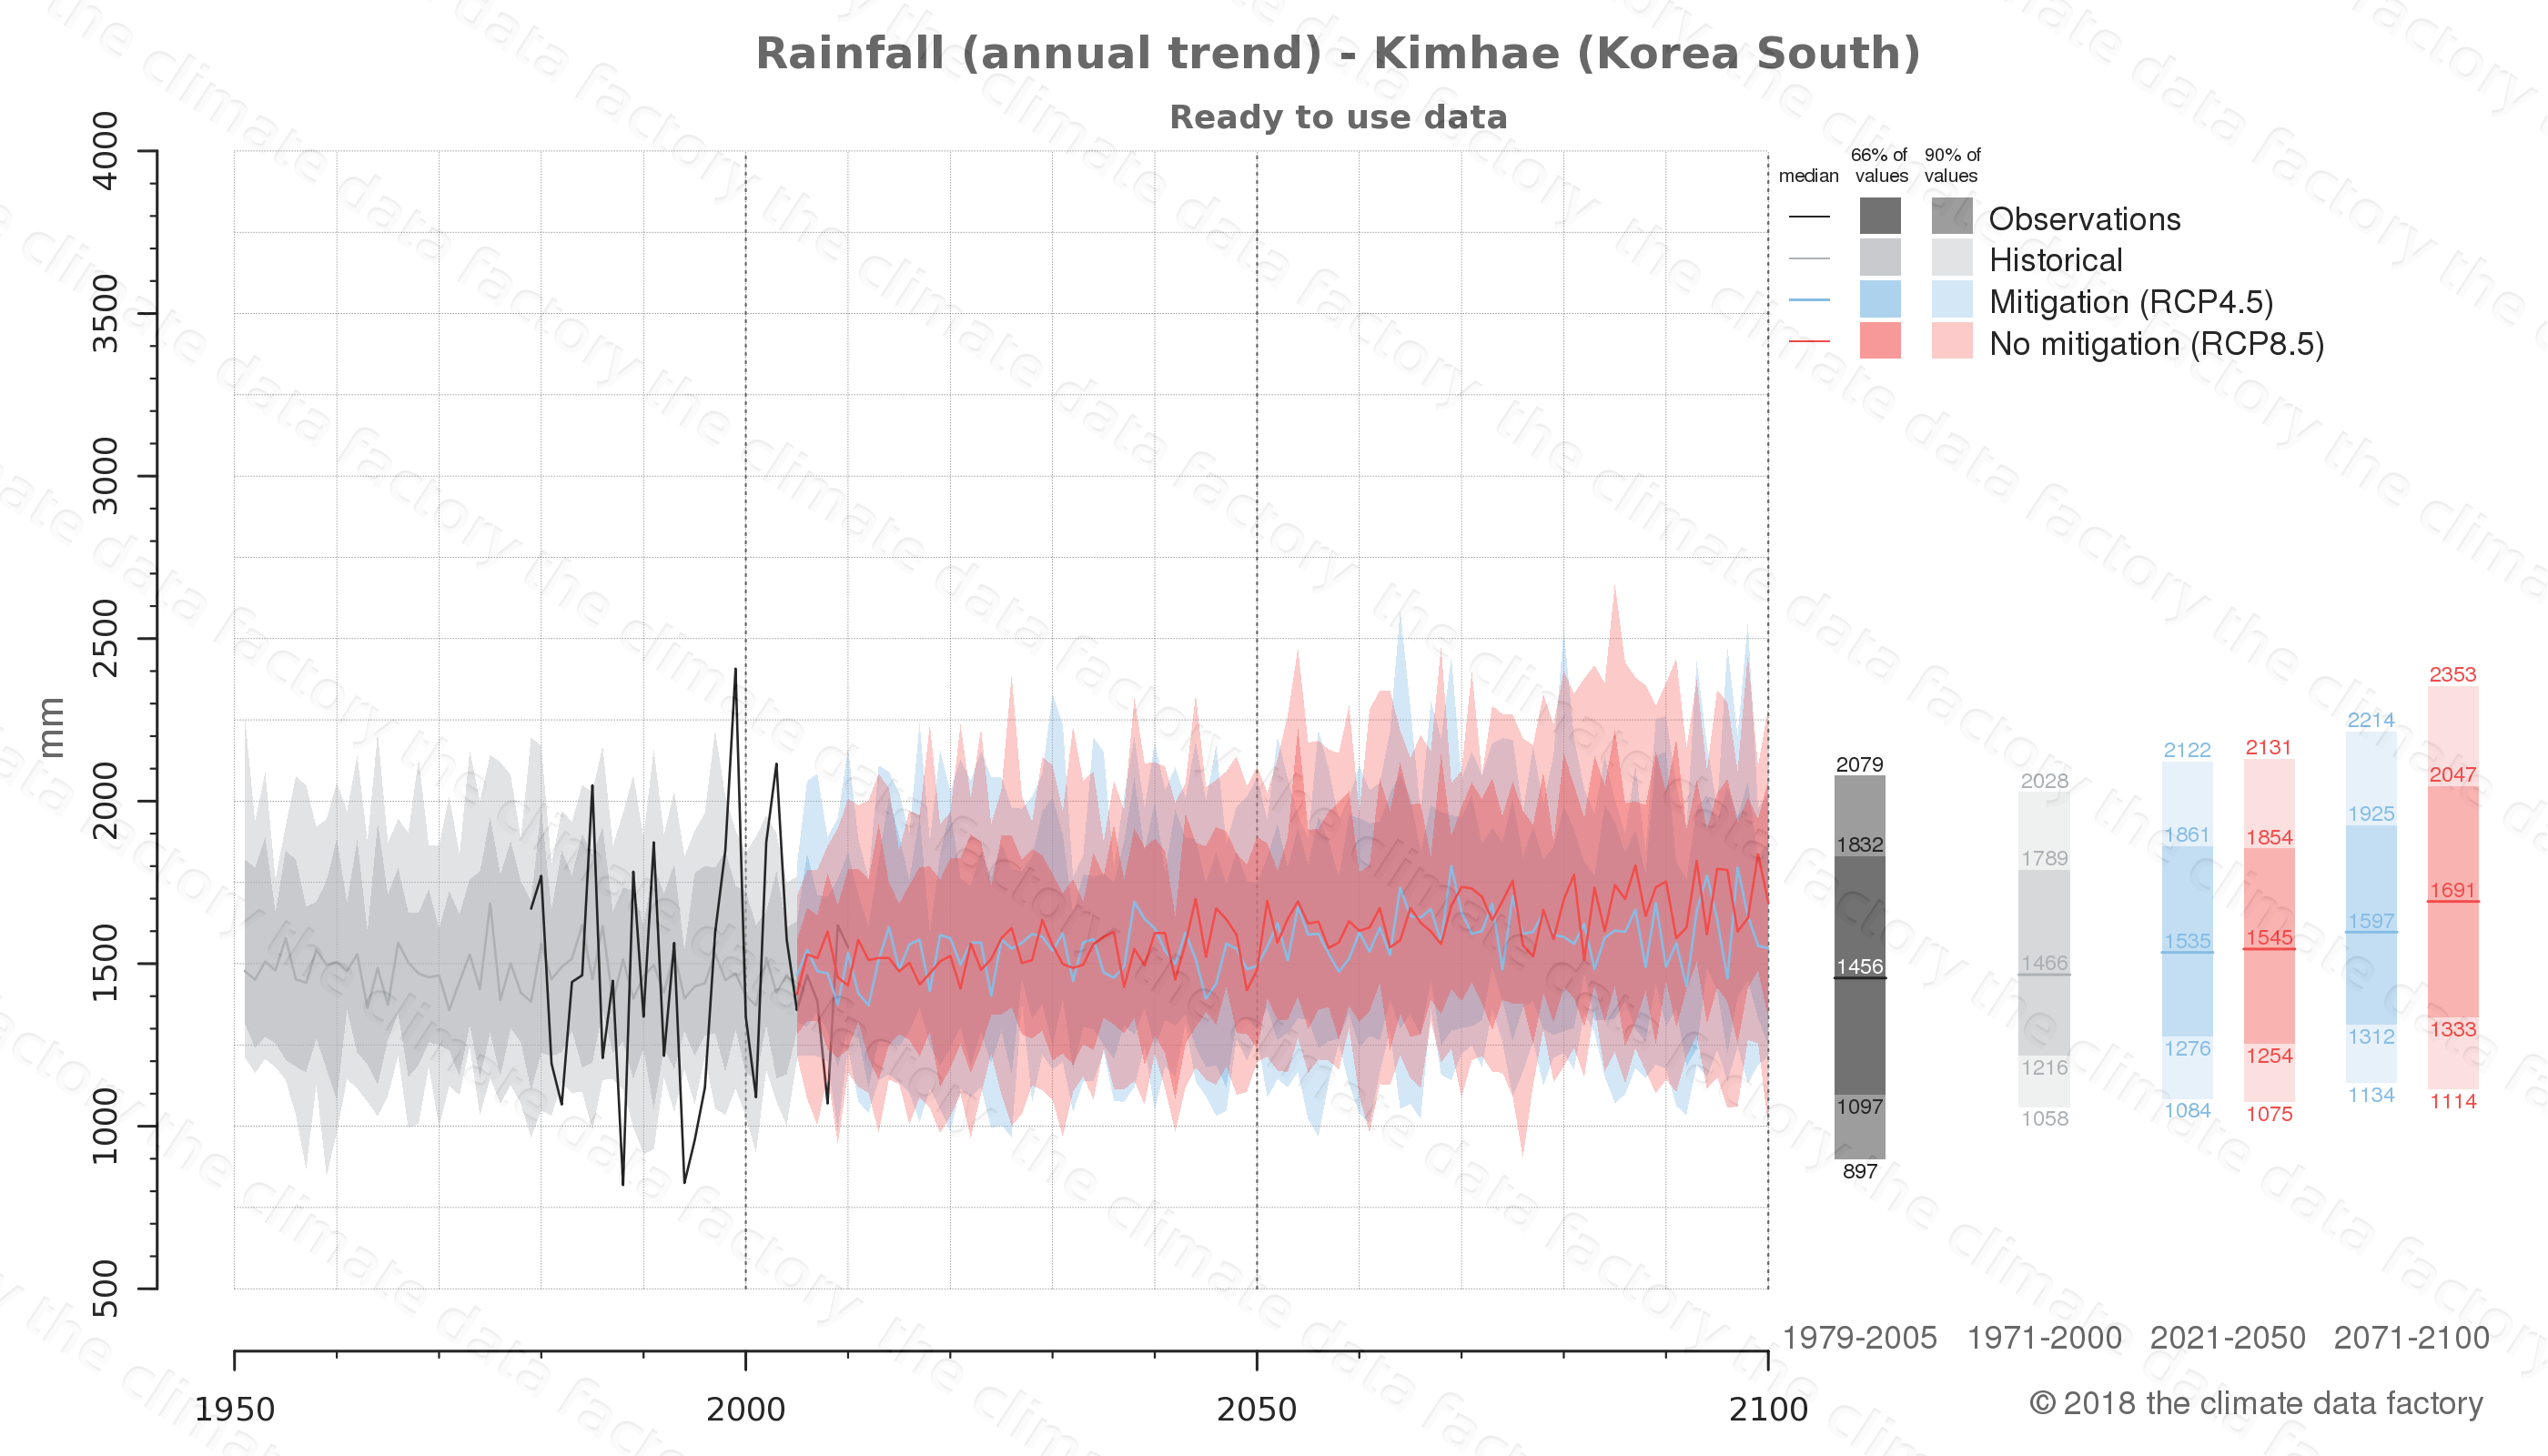 climate change data policy adaptation climate graph city data rainfall kimhae south korea